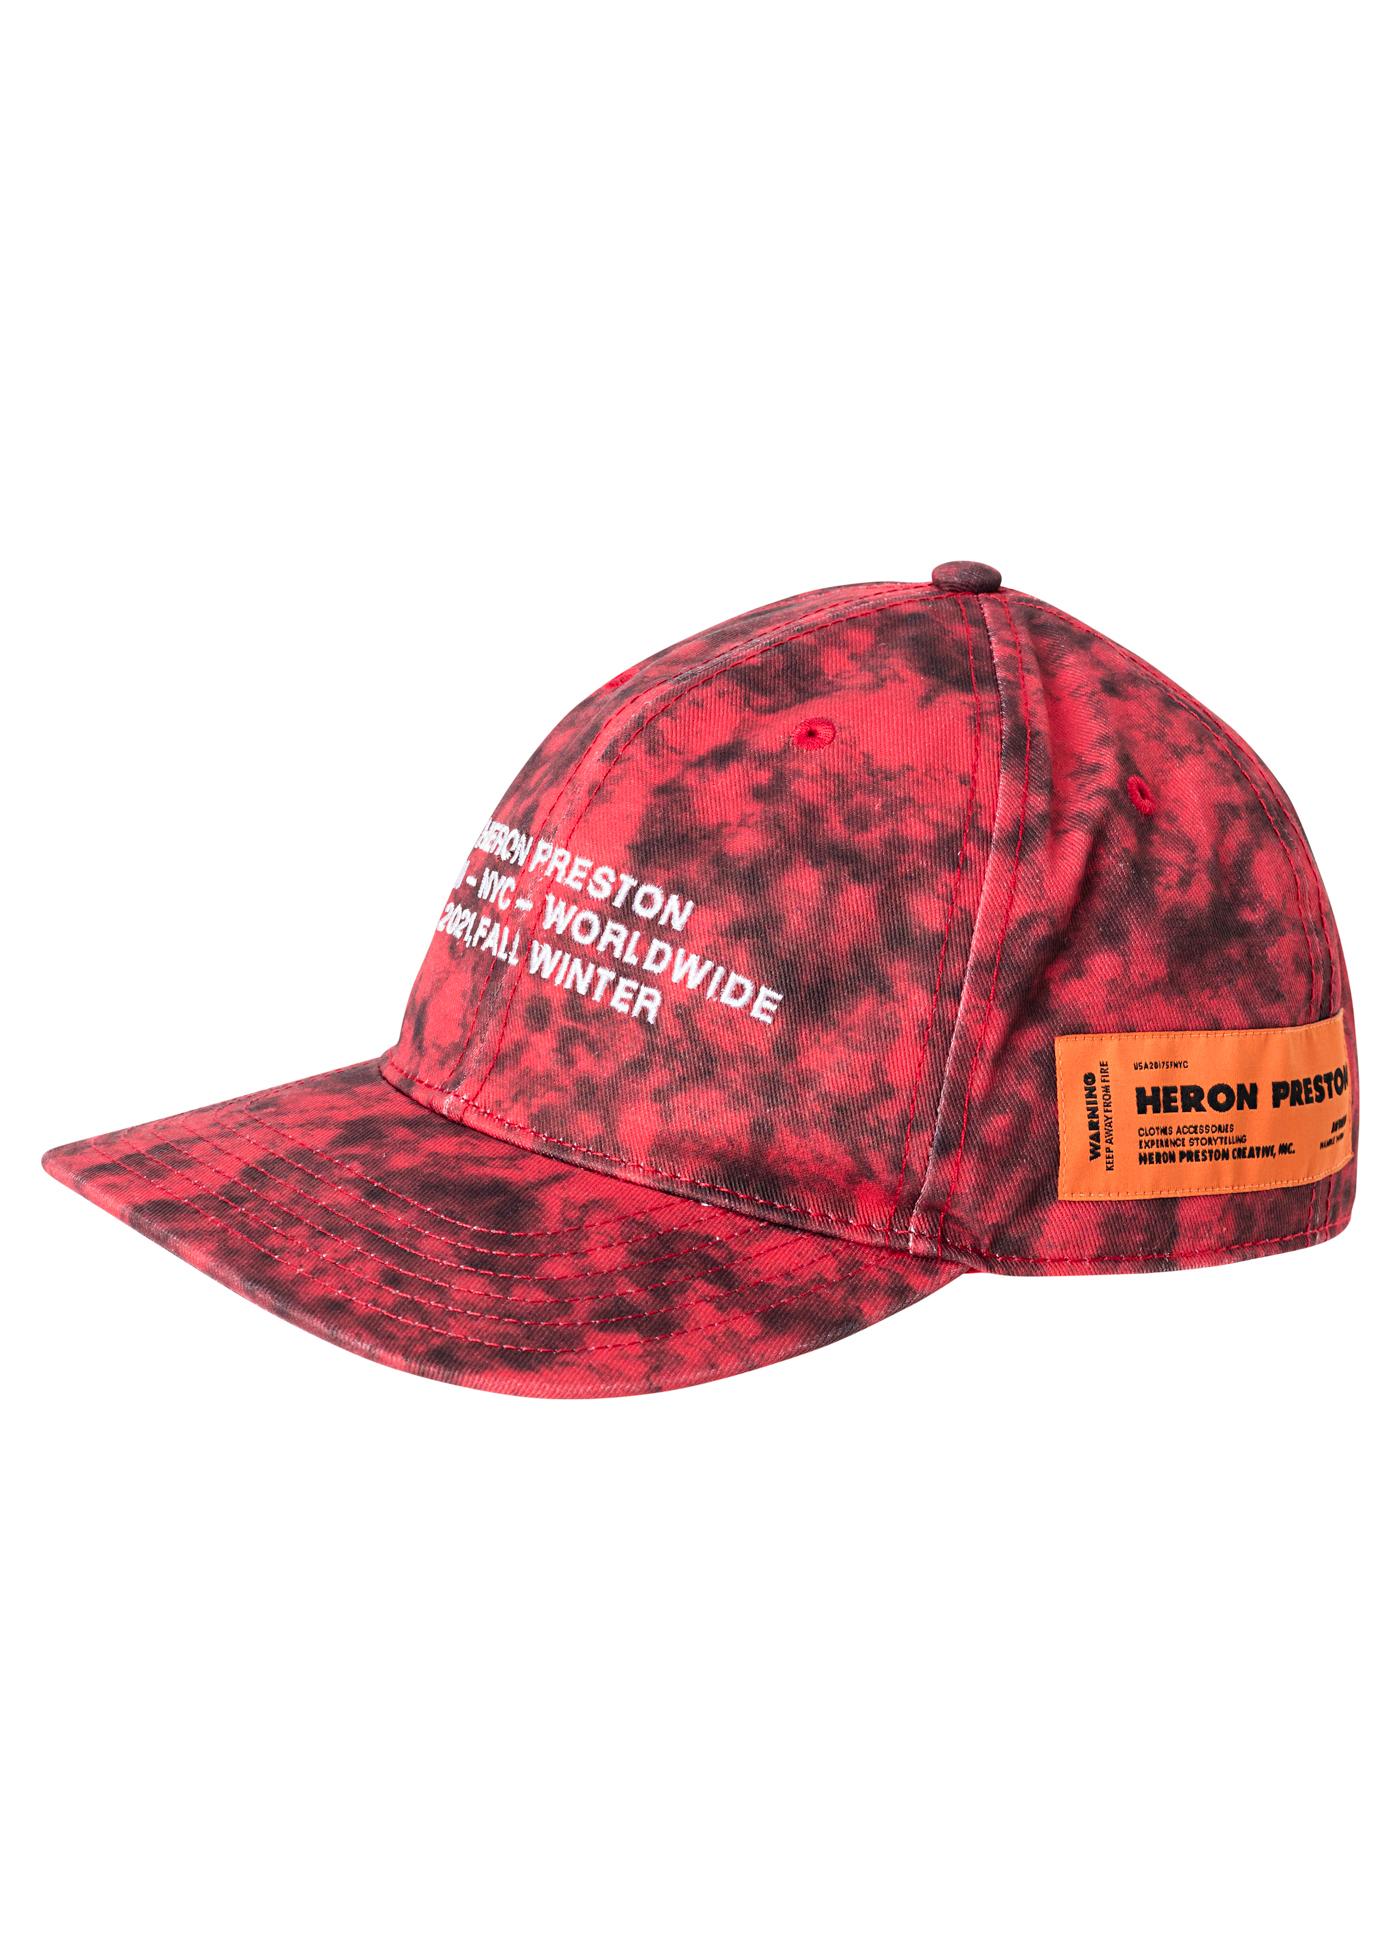 TIE DYE MI-NY HAT image number 0